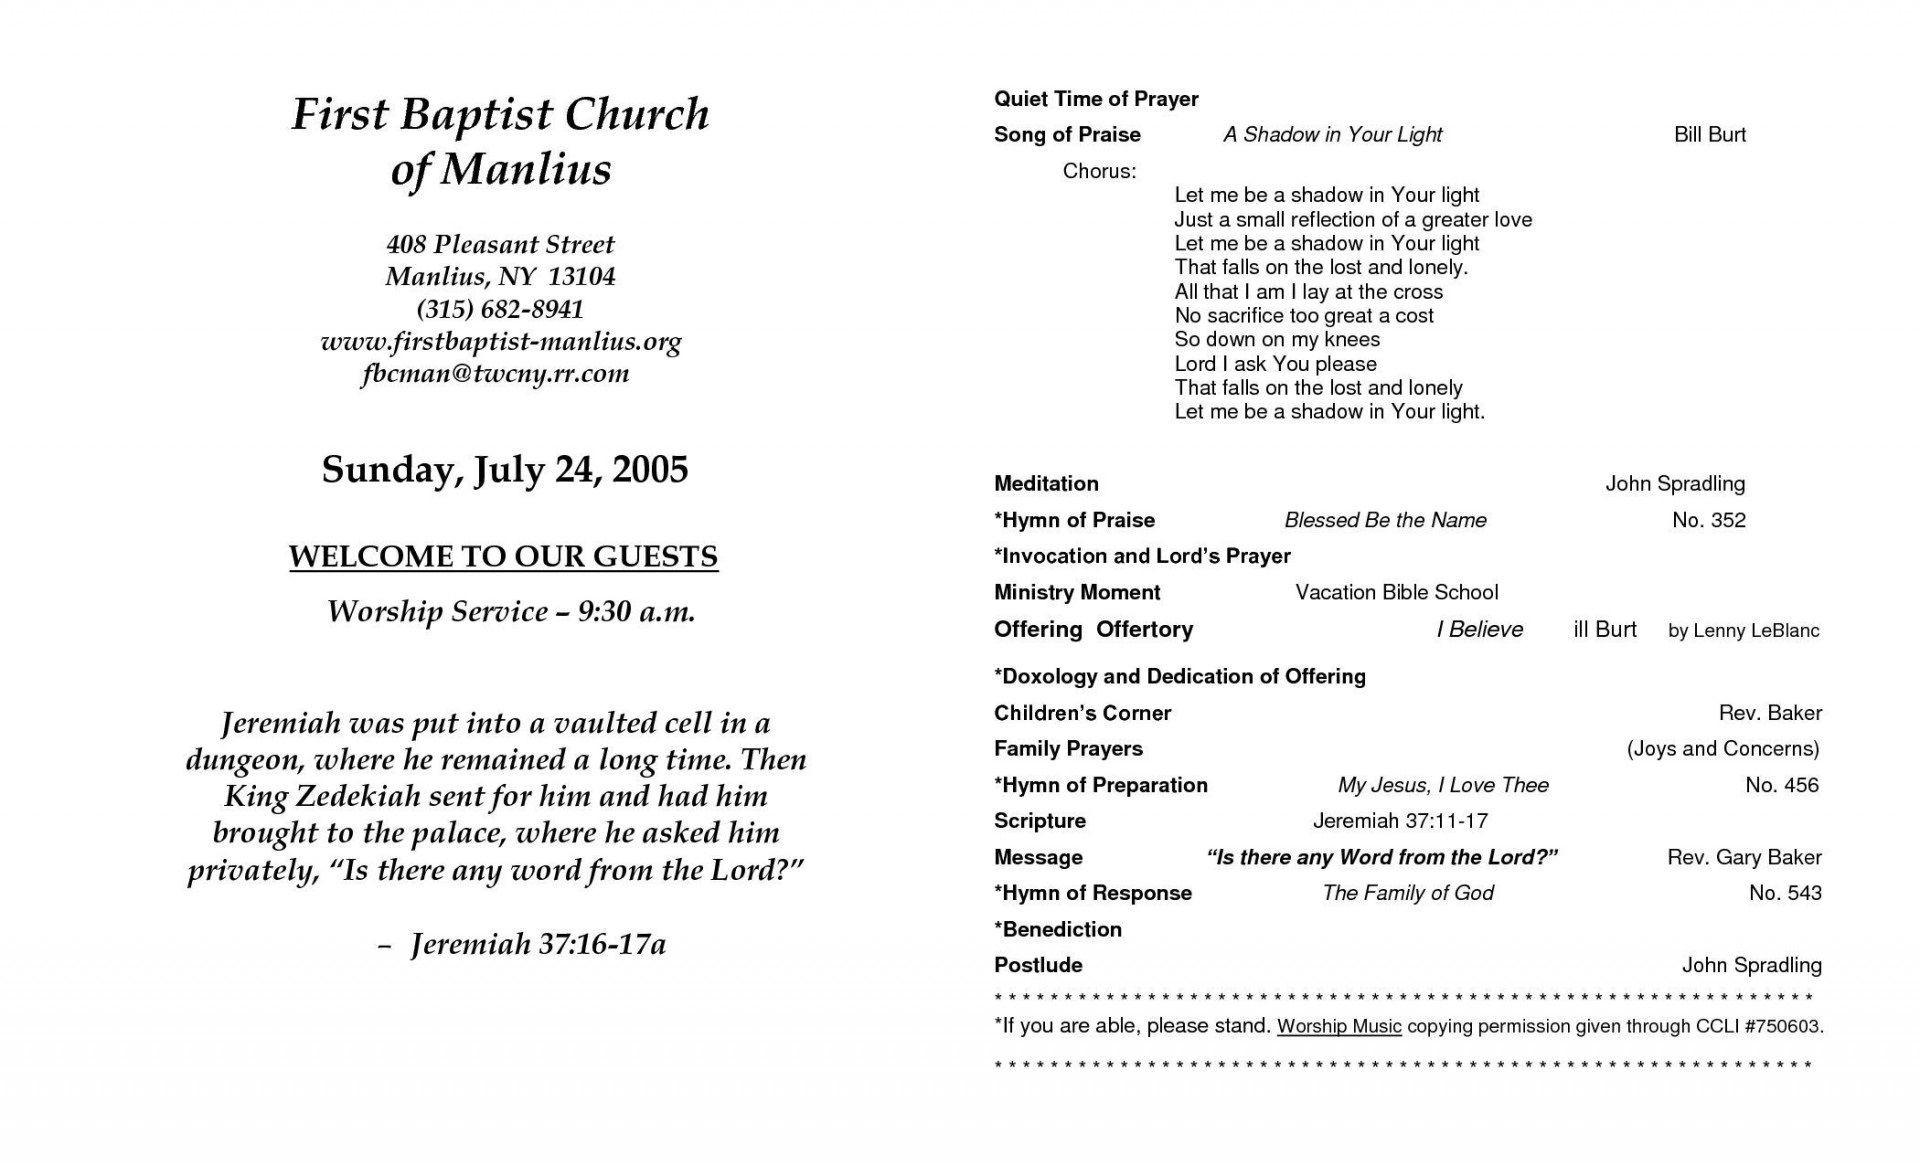 008 Unforgettable Free Church Program Template Download Inspiration  Downloads Bulletin1920